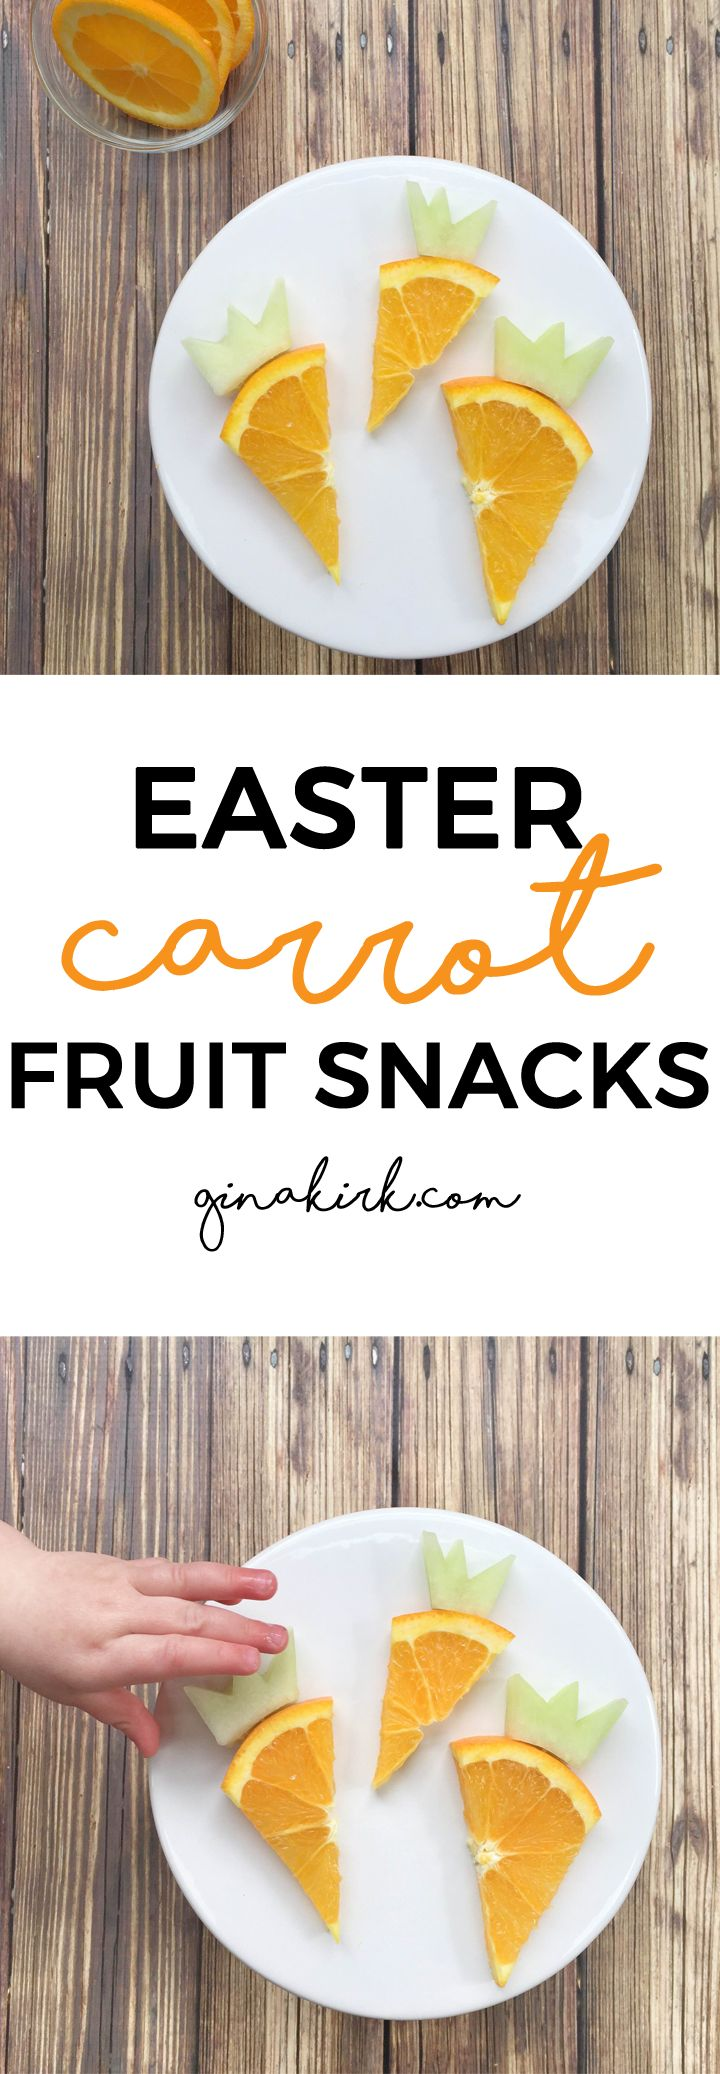 Easter carrot fruit snacks | Easter treat recipe tutorial | Toddler Easter idea | Carrot shaped breakfast idea | GinaKirk.com @ginaekirk